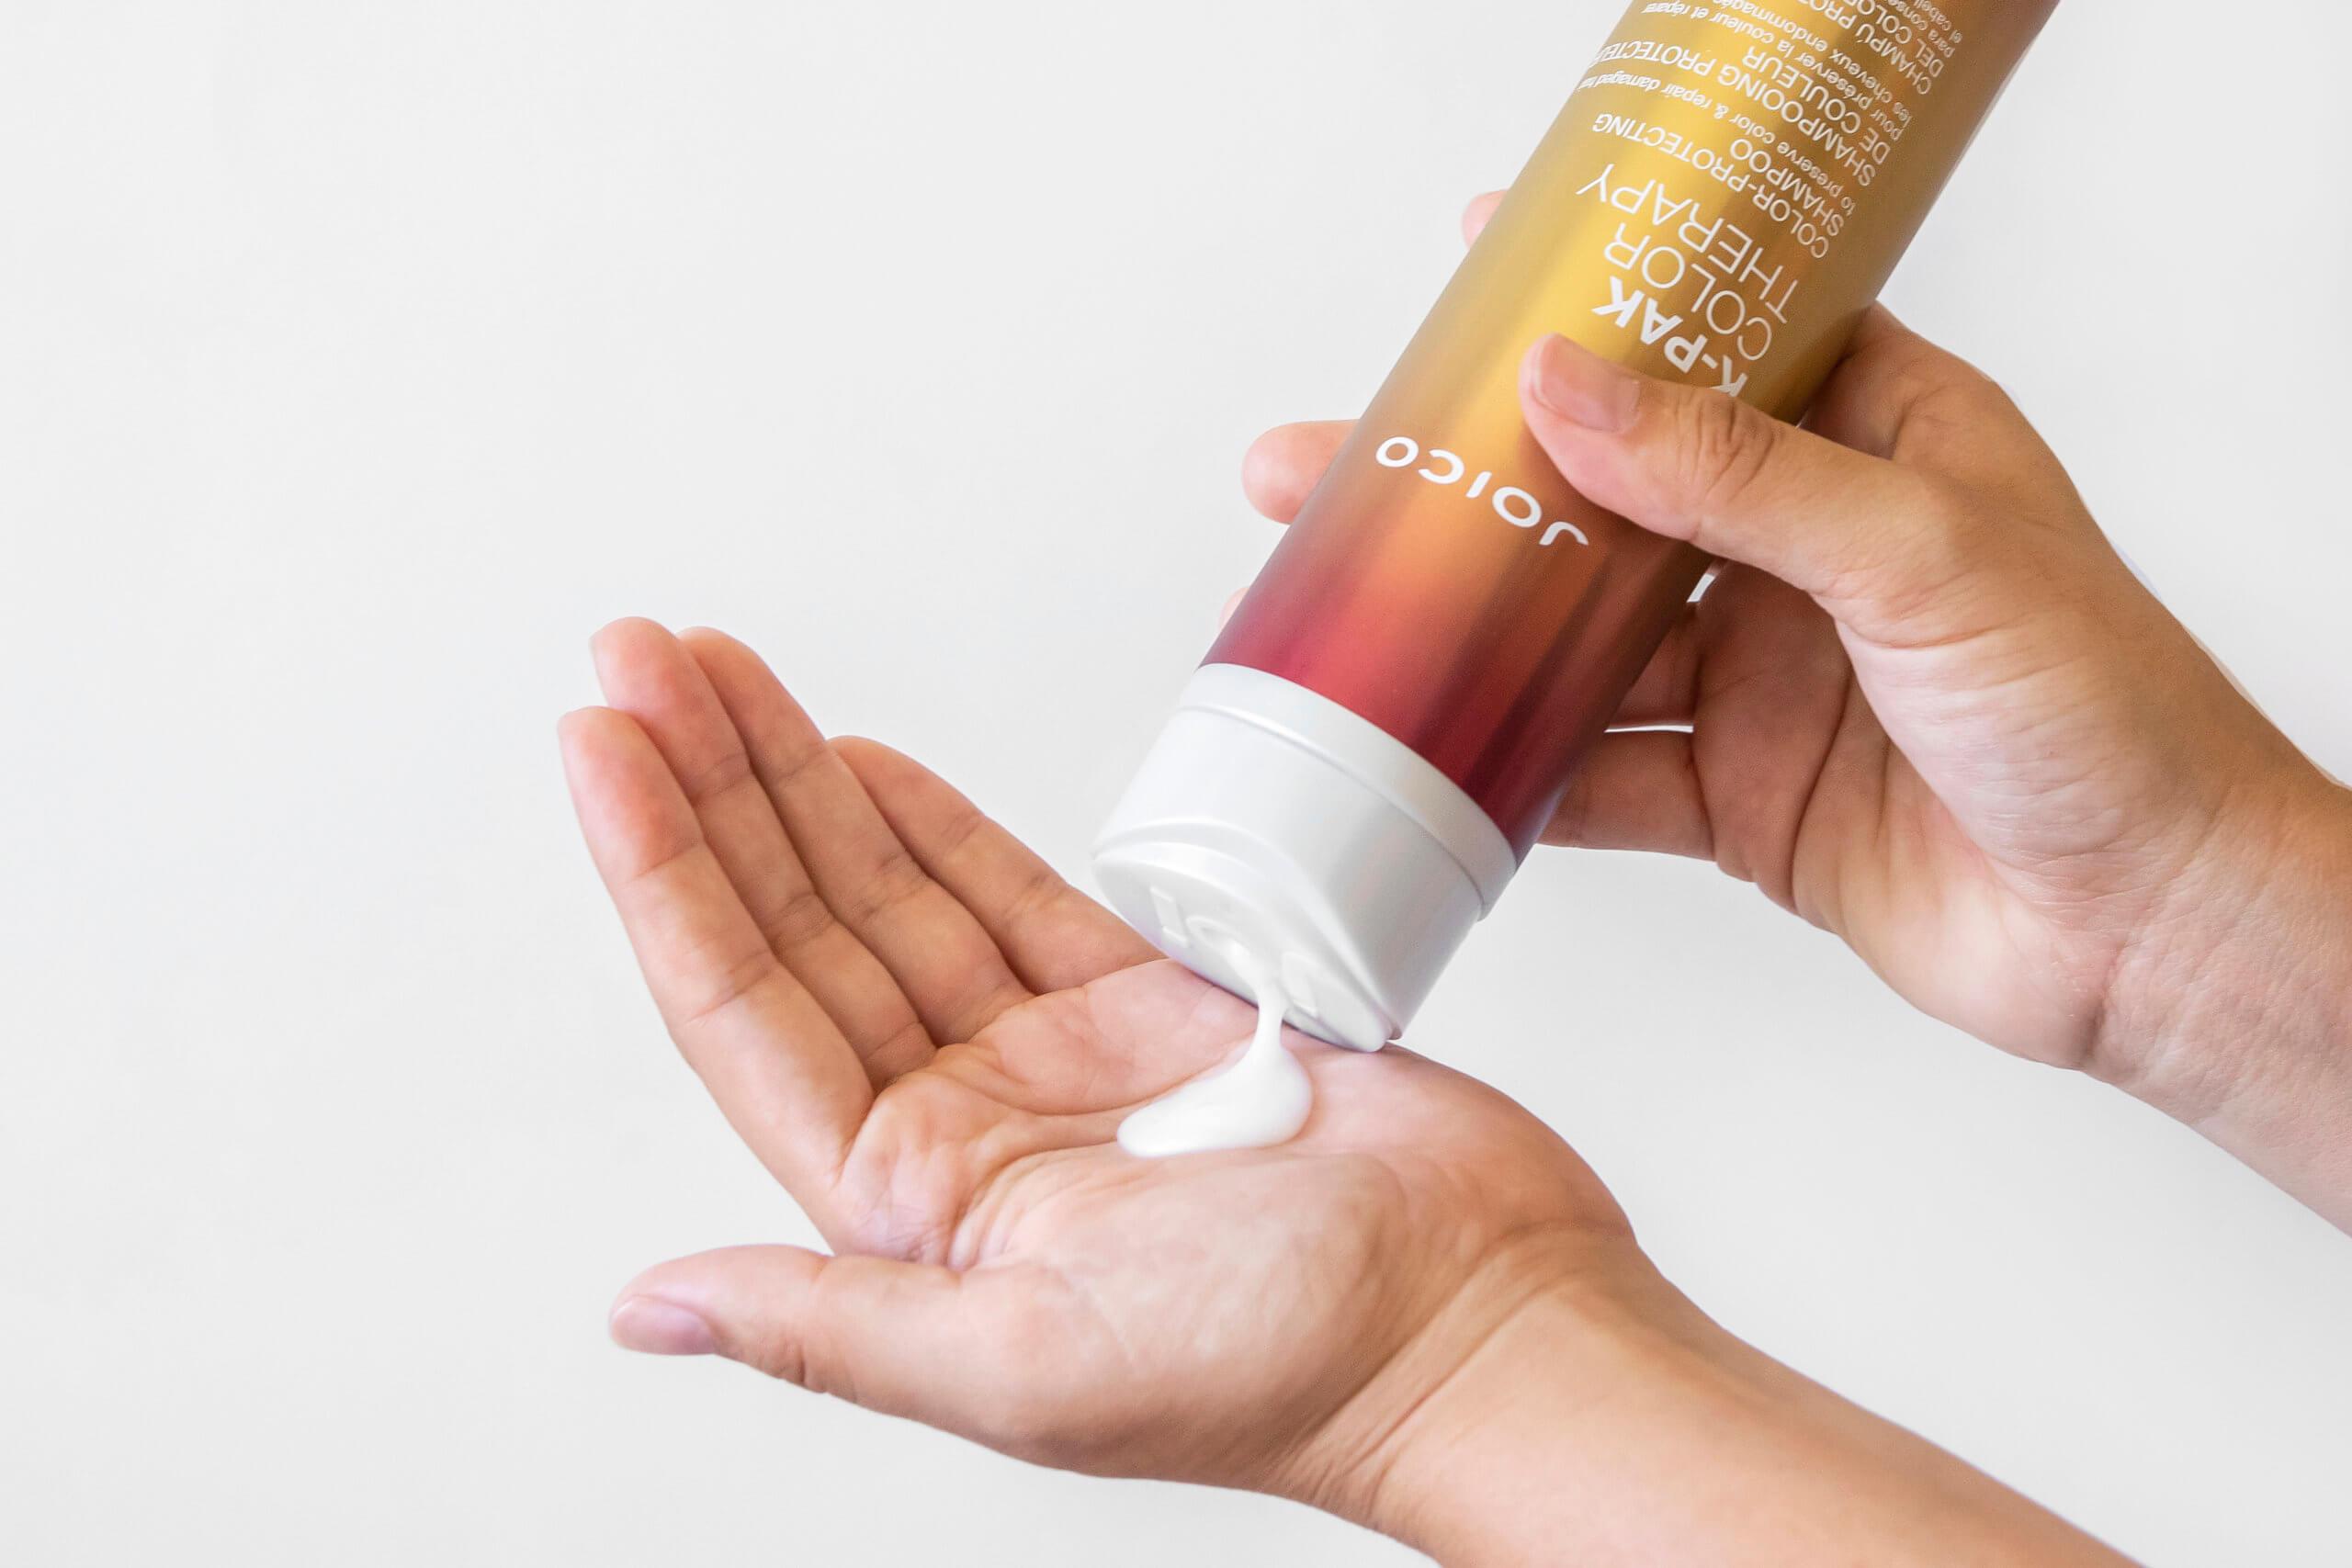 Joico K-Pak shampoo squeezing into hand